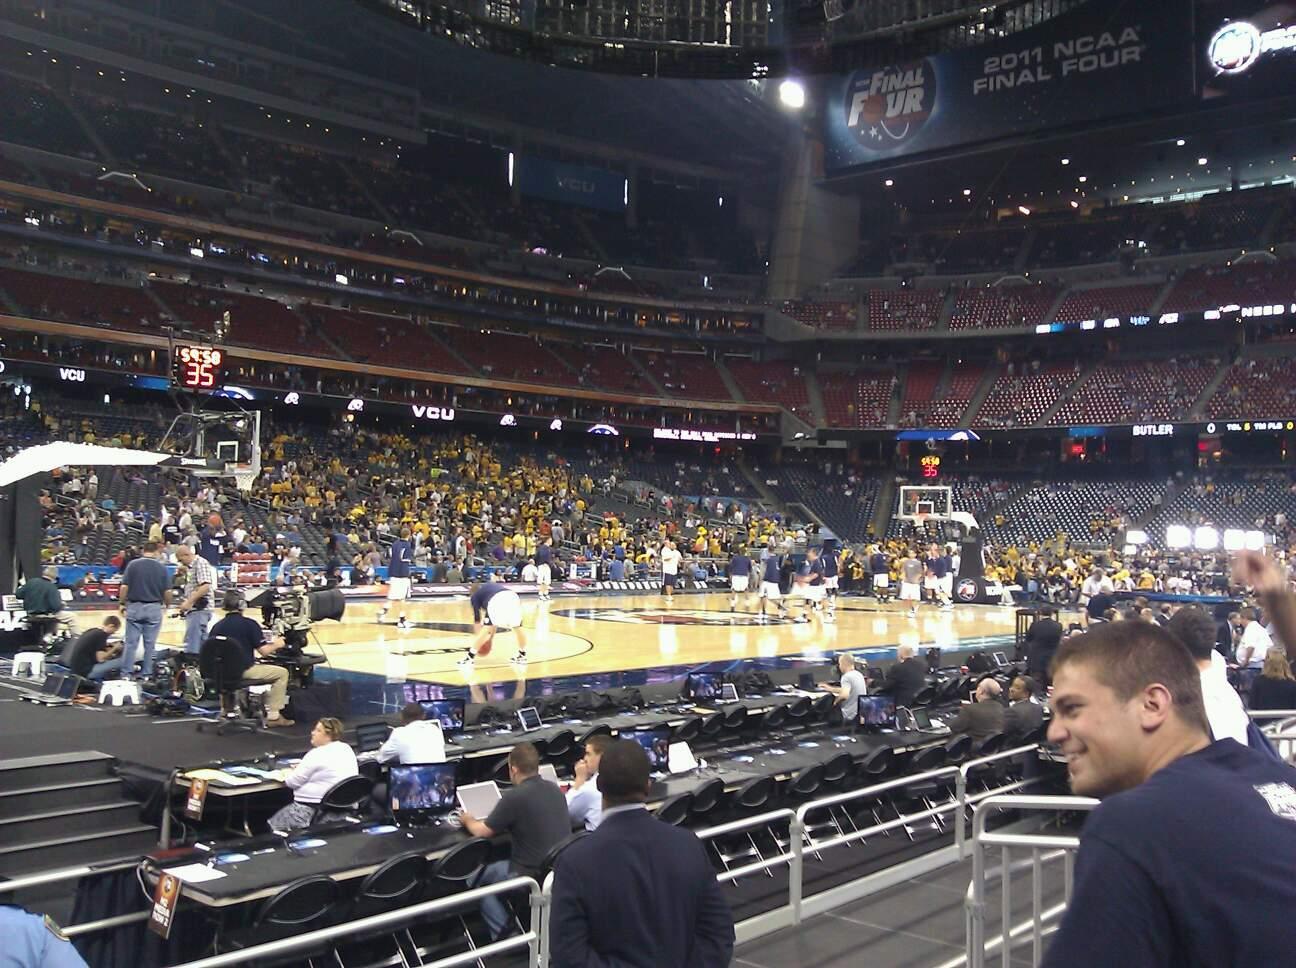 NRG Stadium, section 109, row 5, seat 9 - Butler Bulldogs vs Virginia